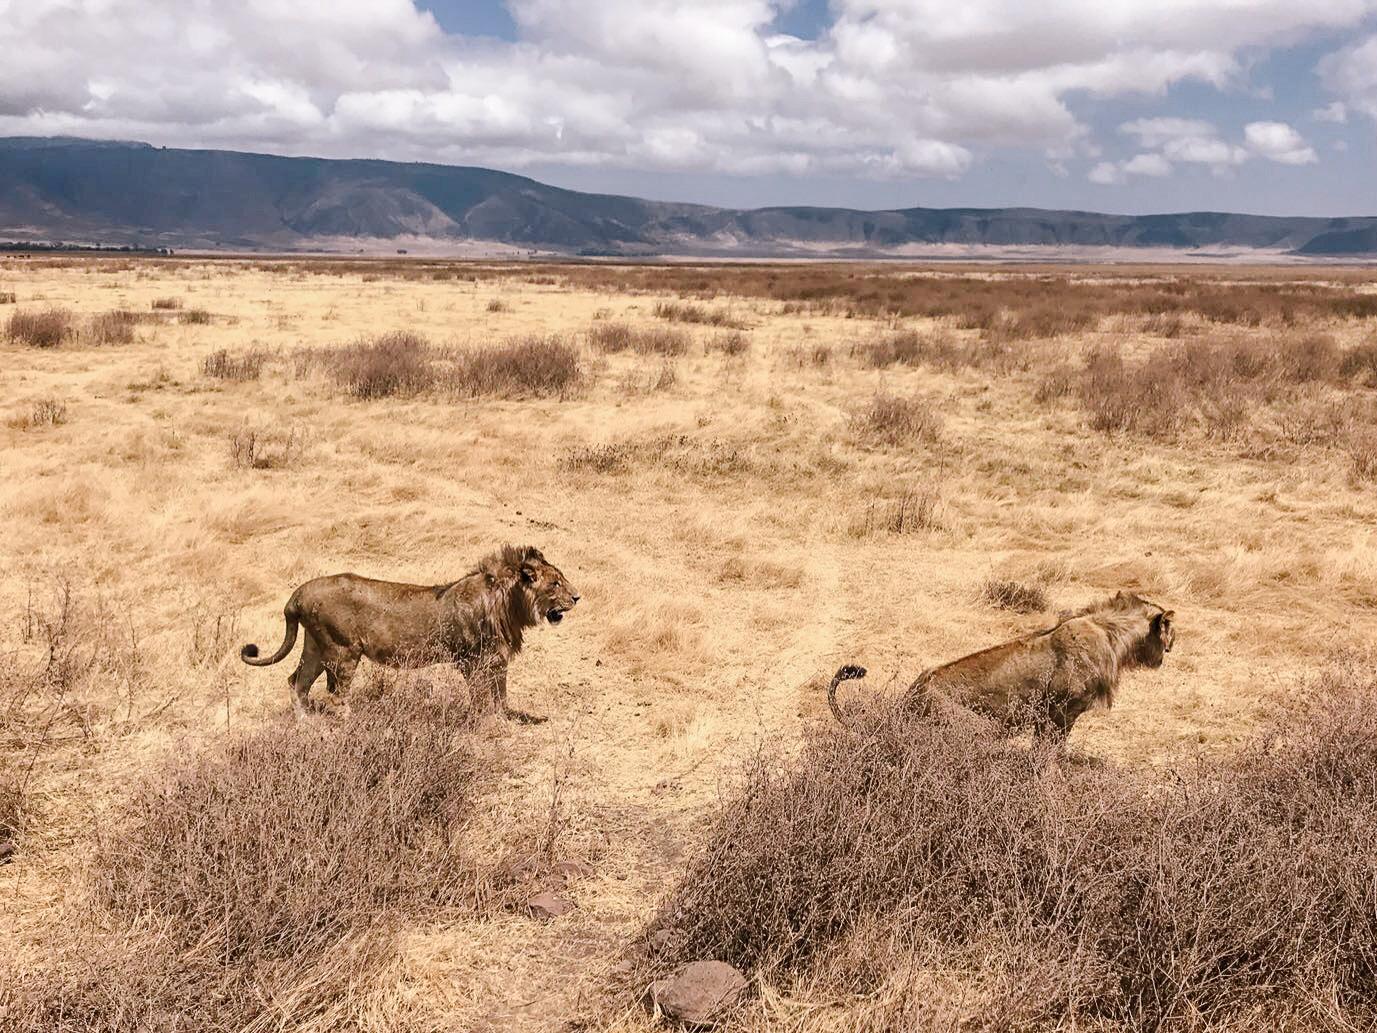 Lions Safari - East African Honeymoon